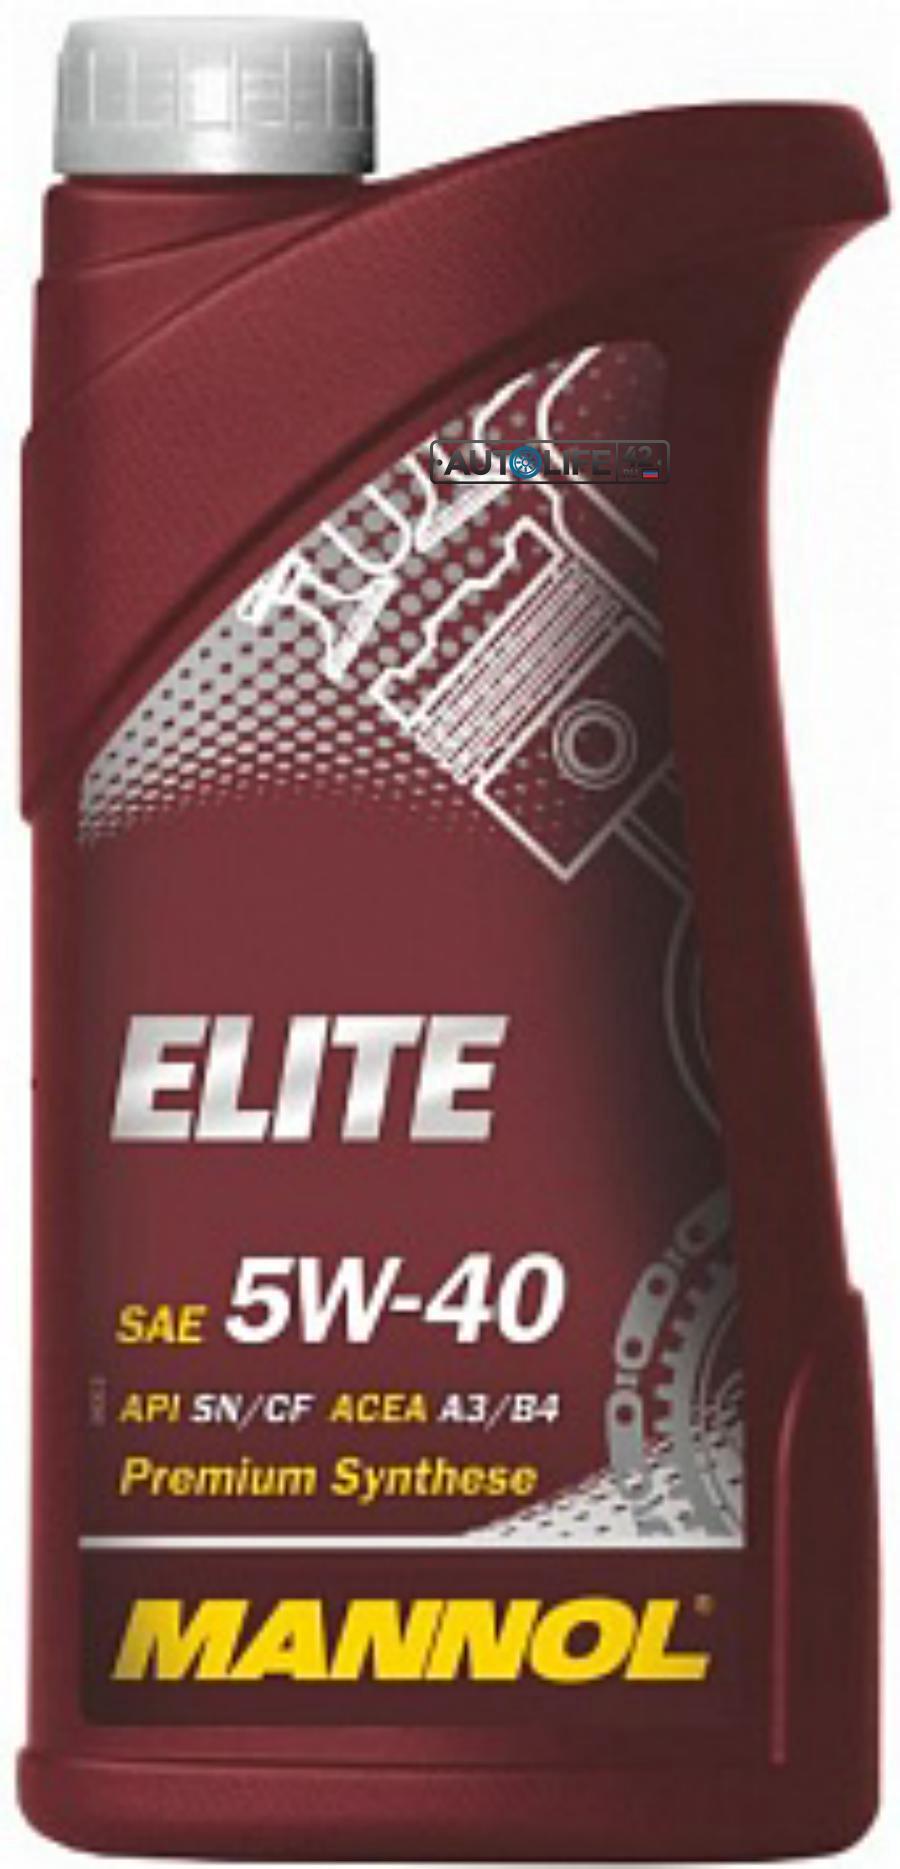 Масло моторное синтетическое ELITE 5W-40, 1л